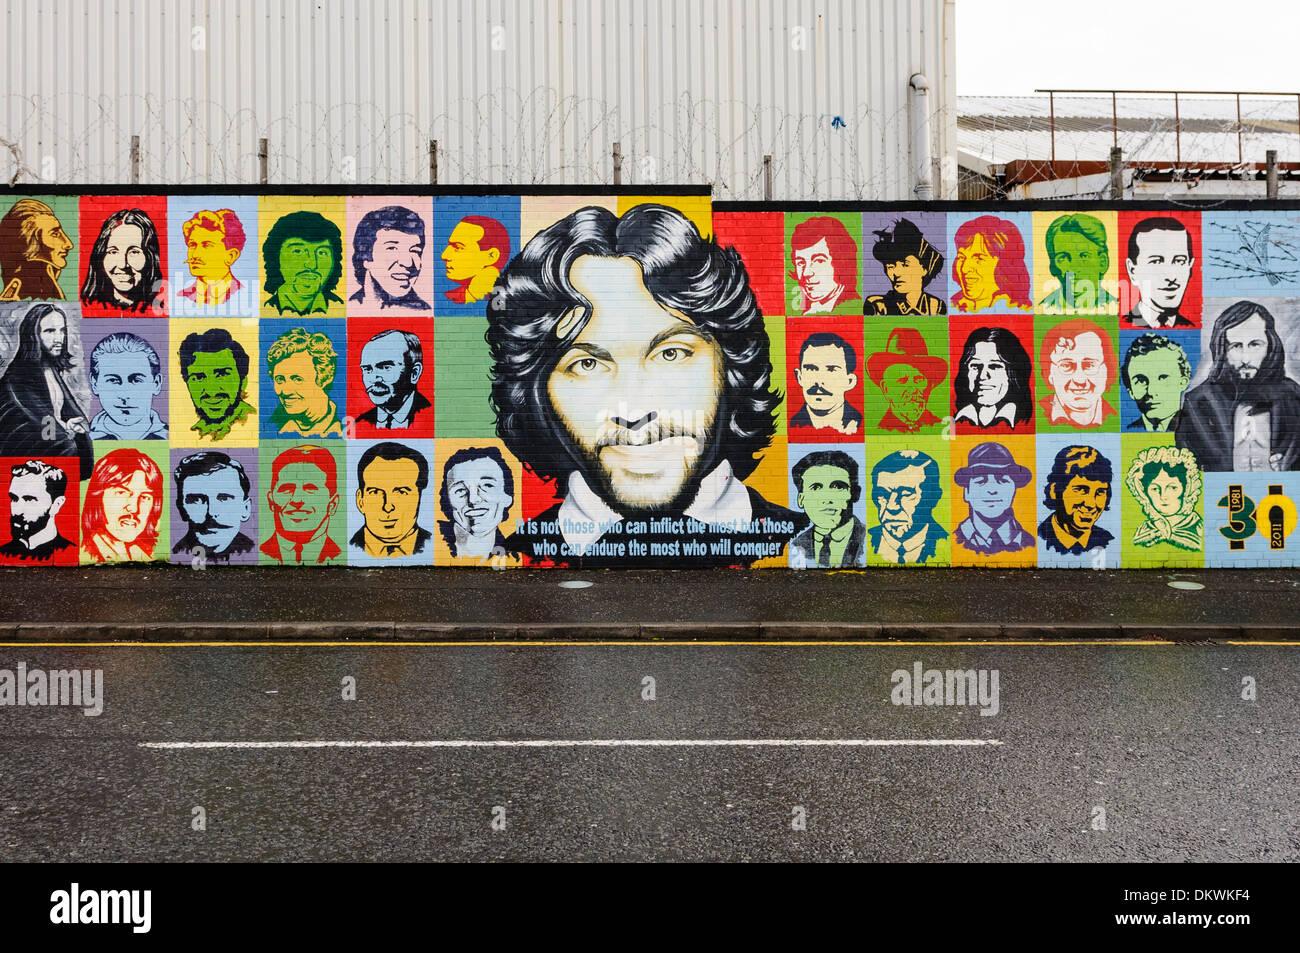 Irish Republican mural at the International Peace Wall, Belfast - Stock Image